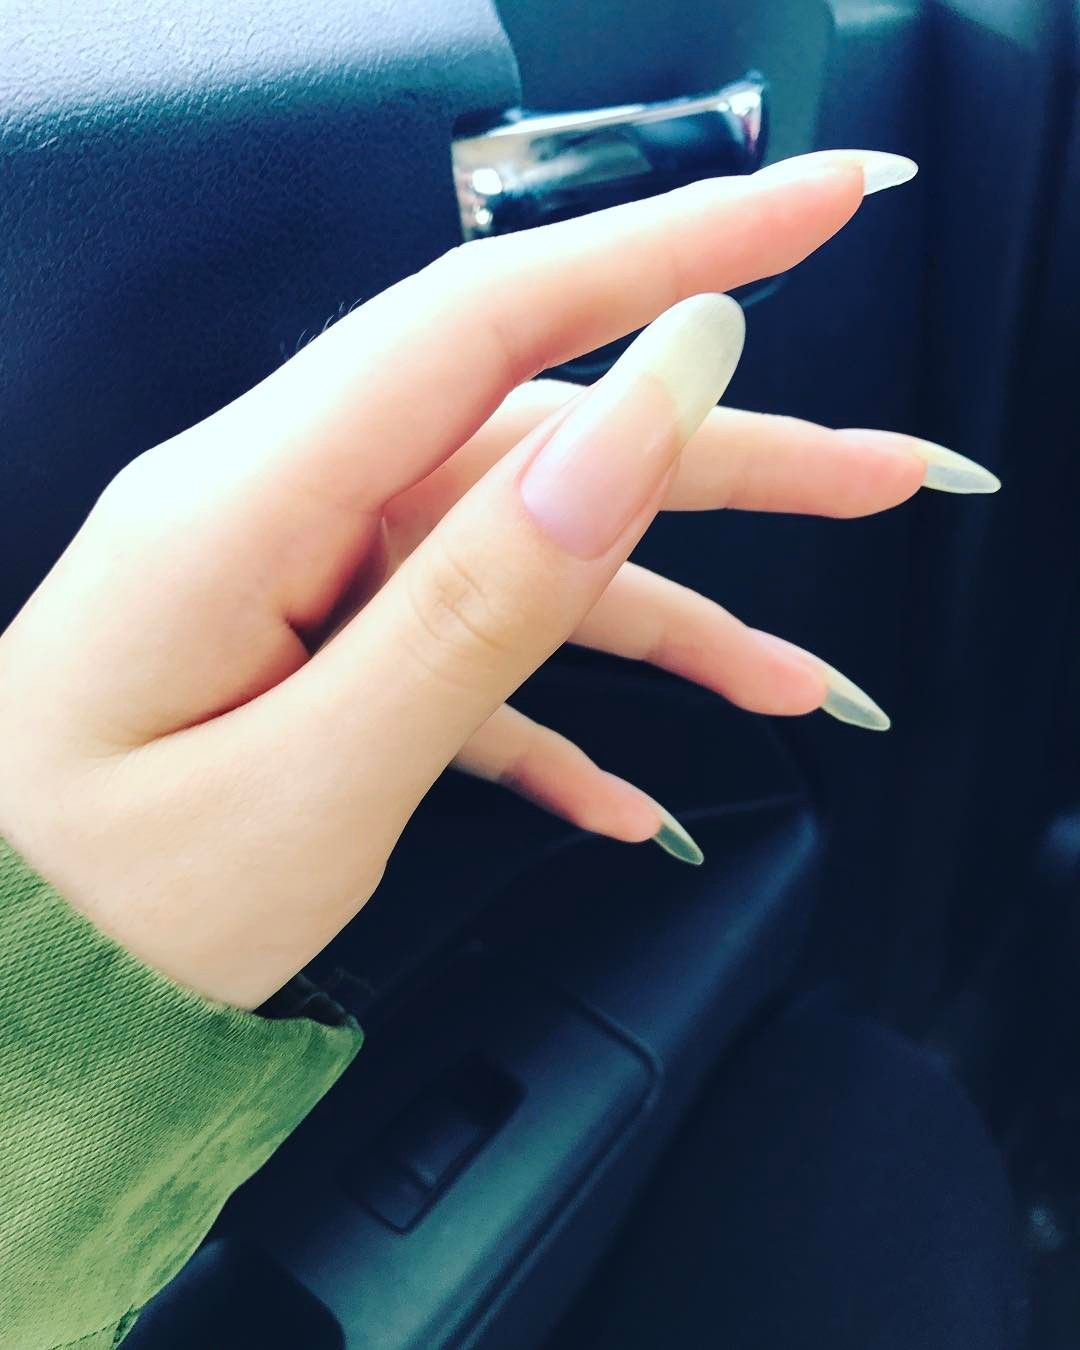 i.prefer.not.giving.my.name* | Nails | Pinterest | Finger hands ...